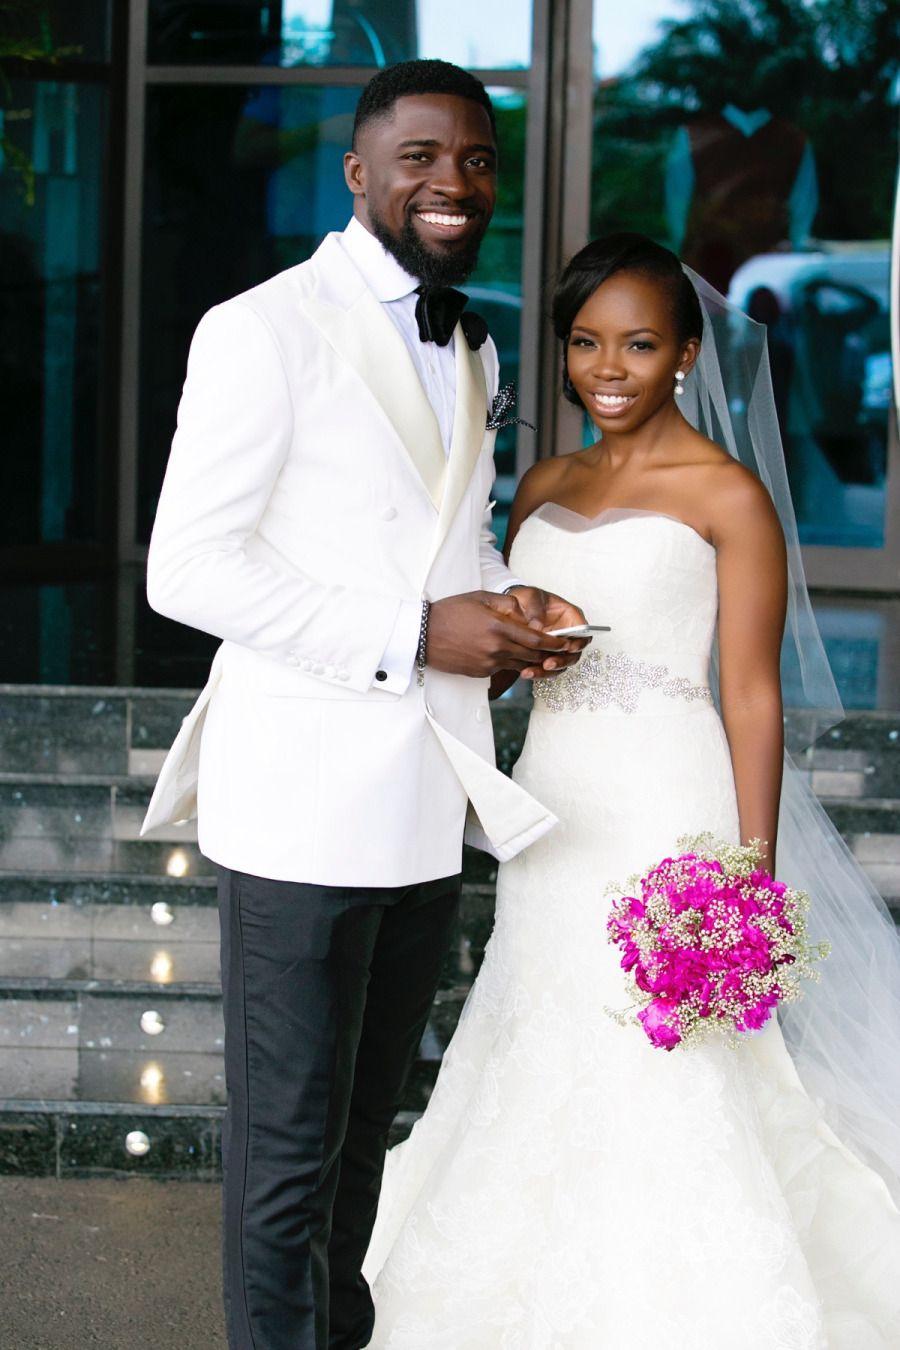 Modern Lagos Wedding at Ruby Gardens, Nigeria | Couples